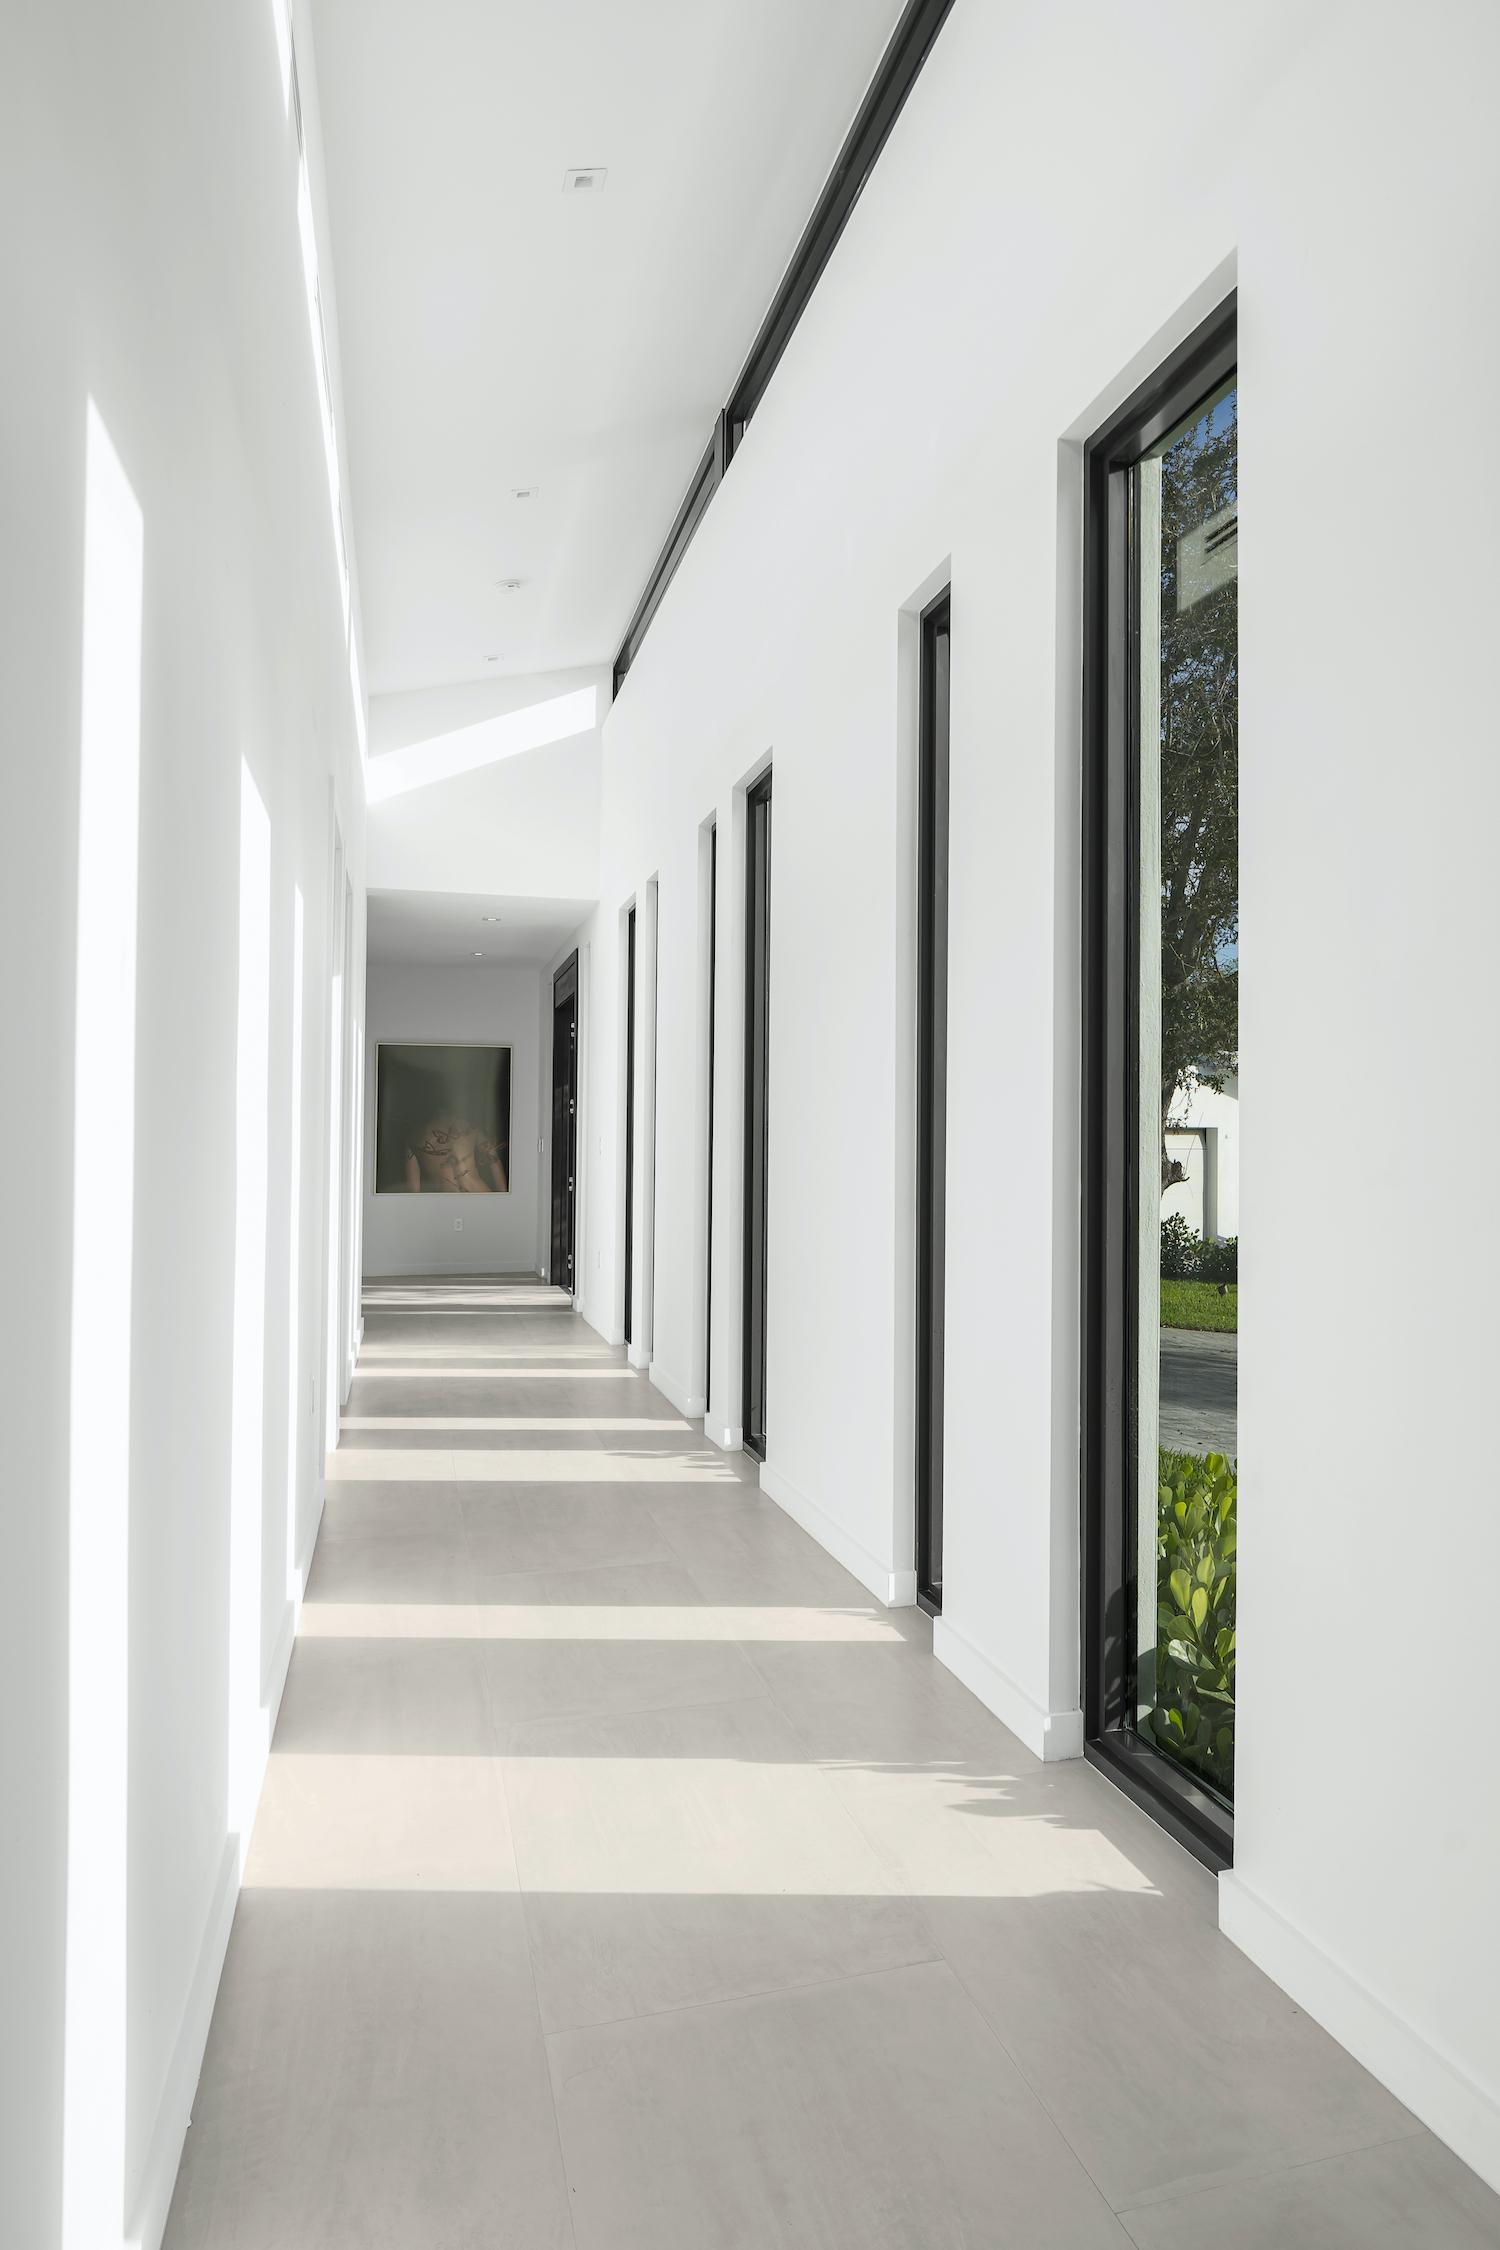 corridor with white walls